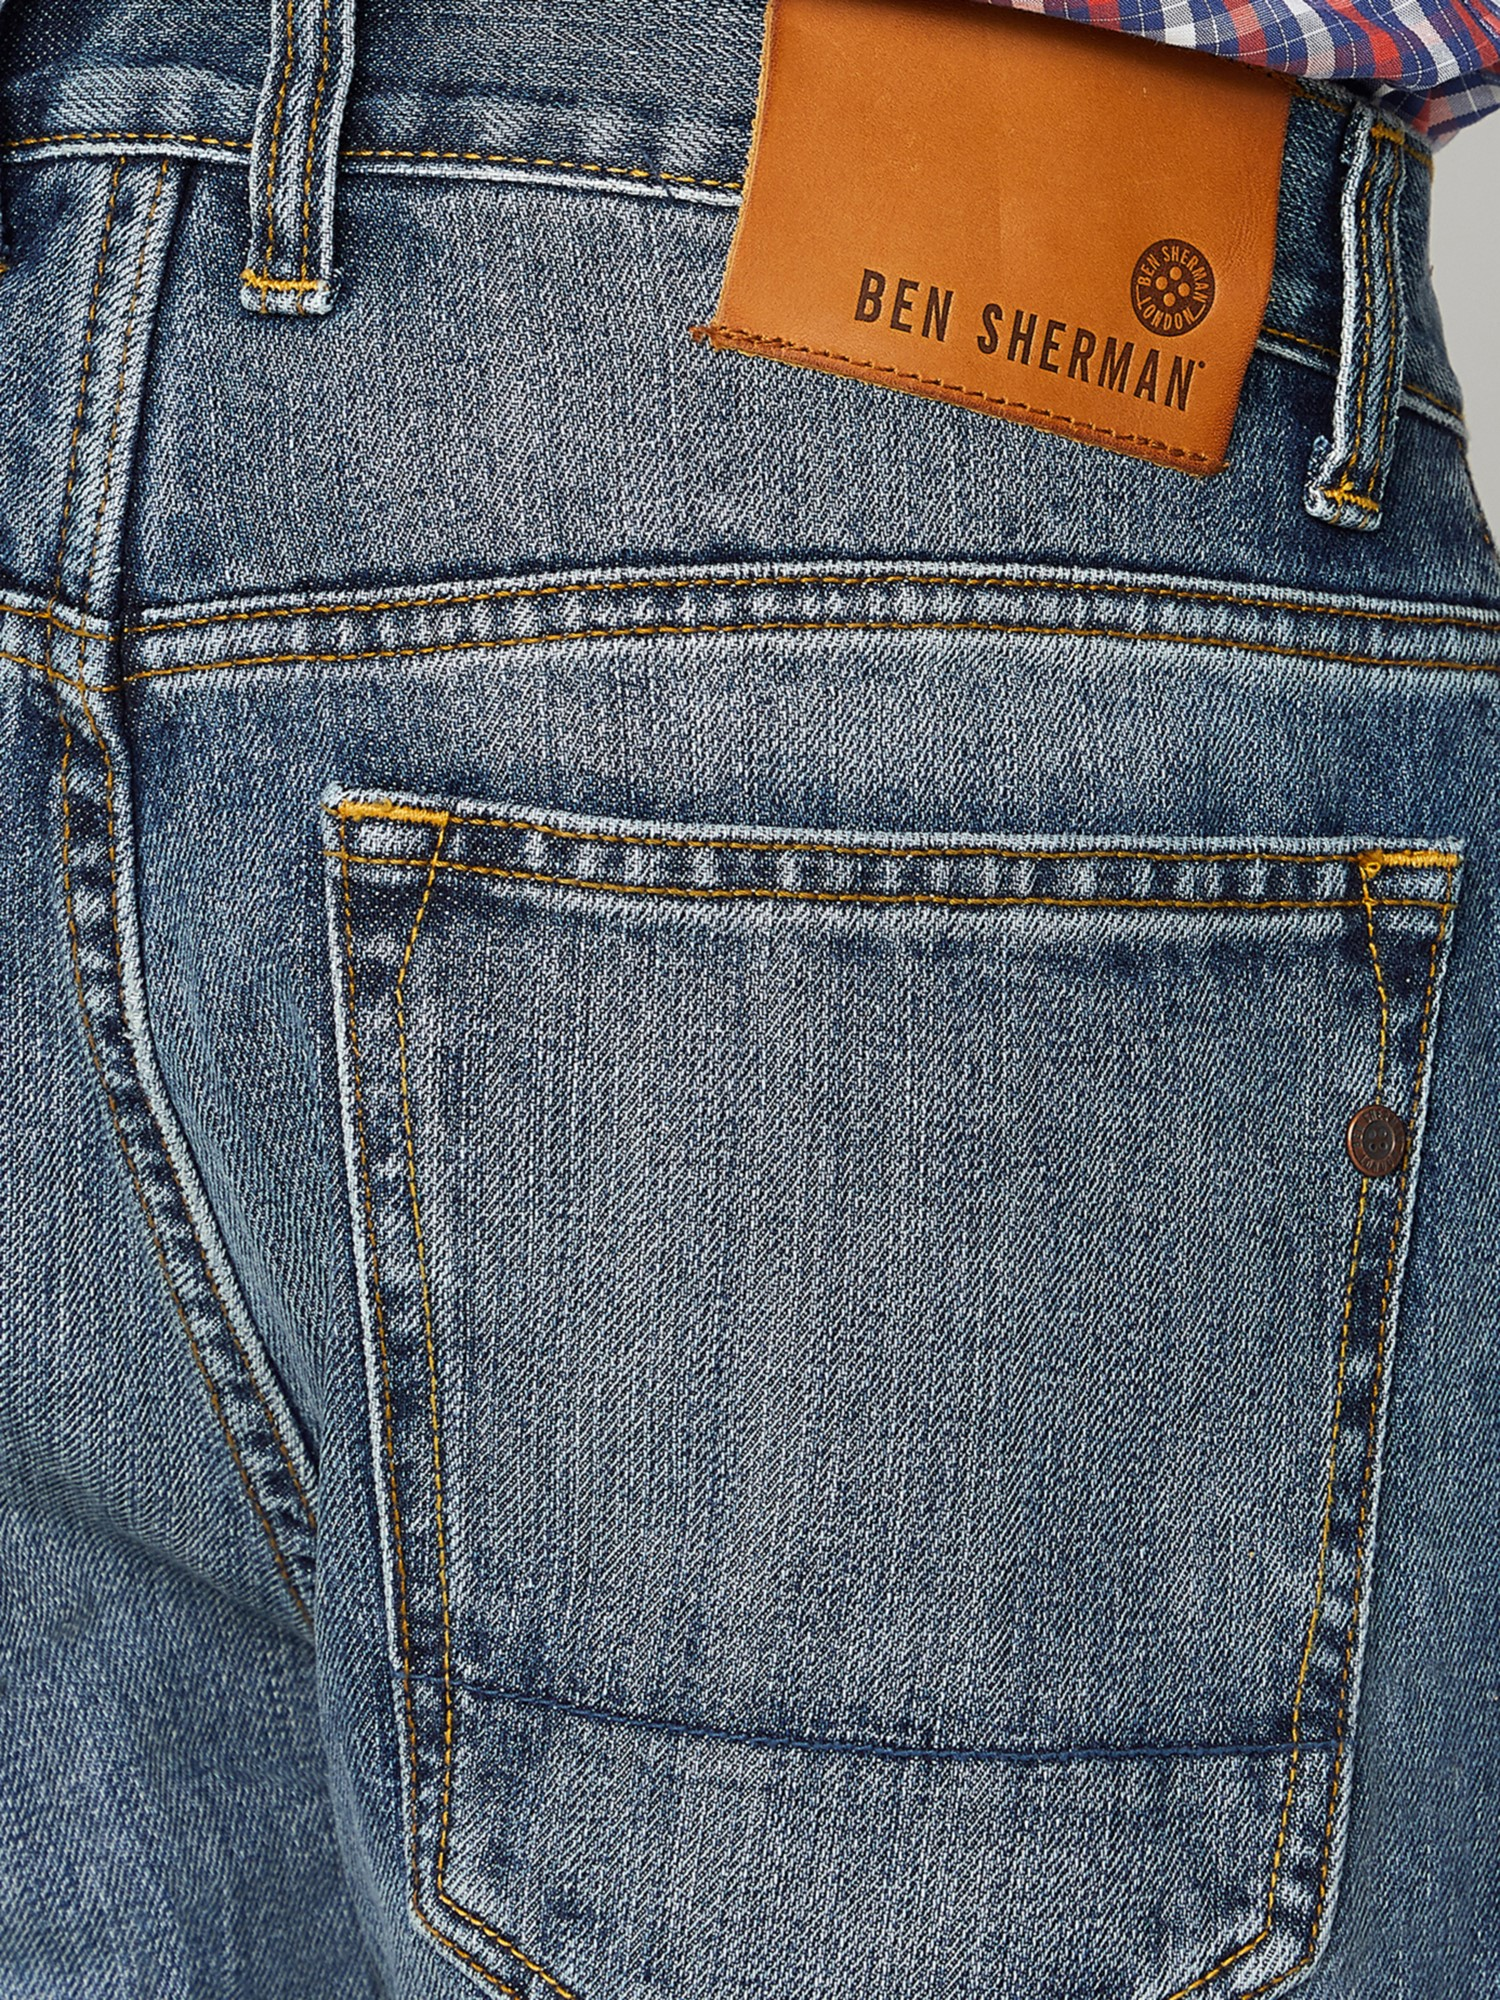 5 Pocket Straight Light Wash Jean